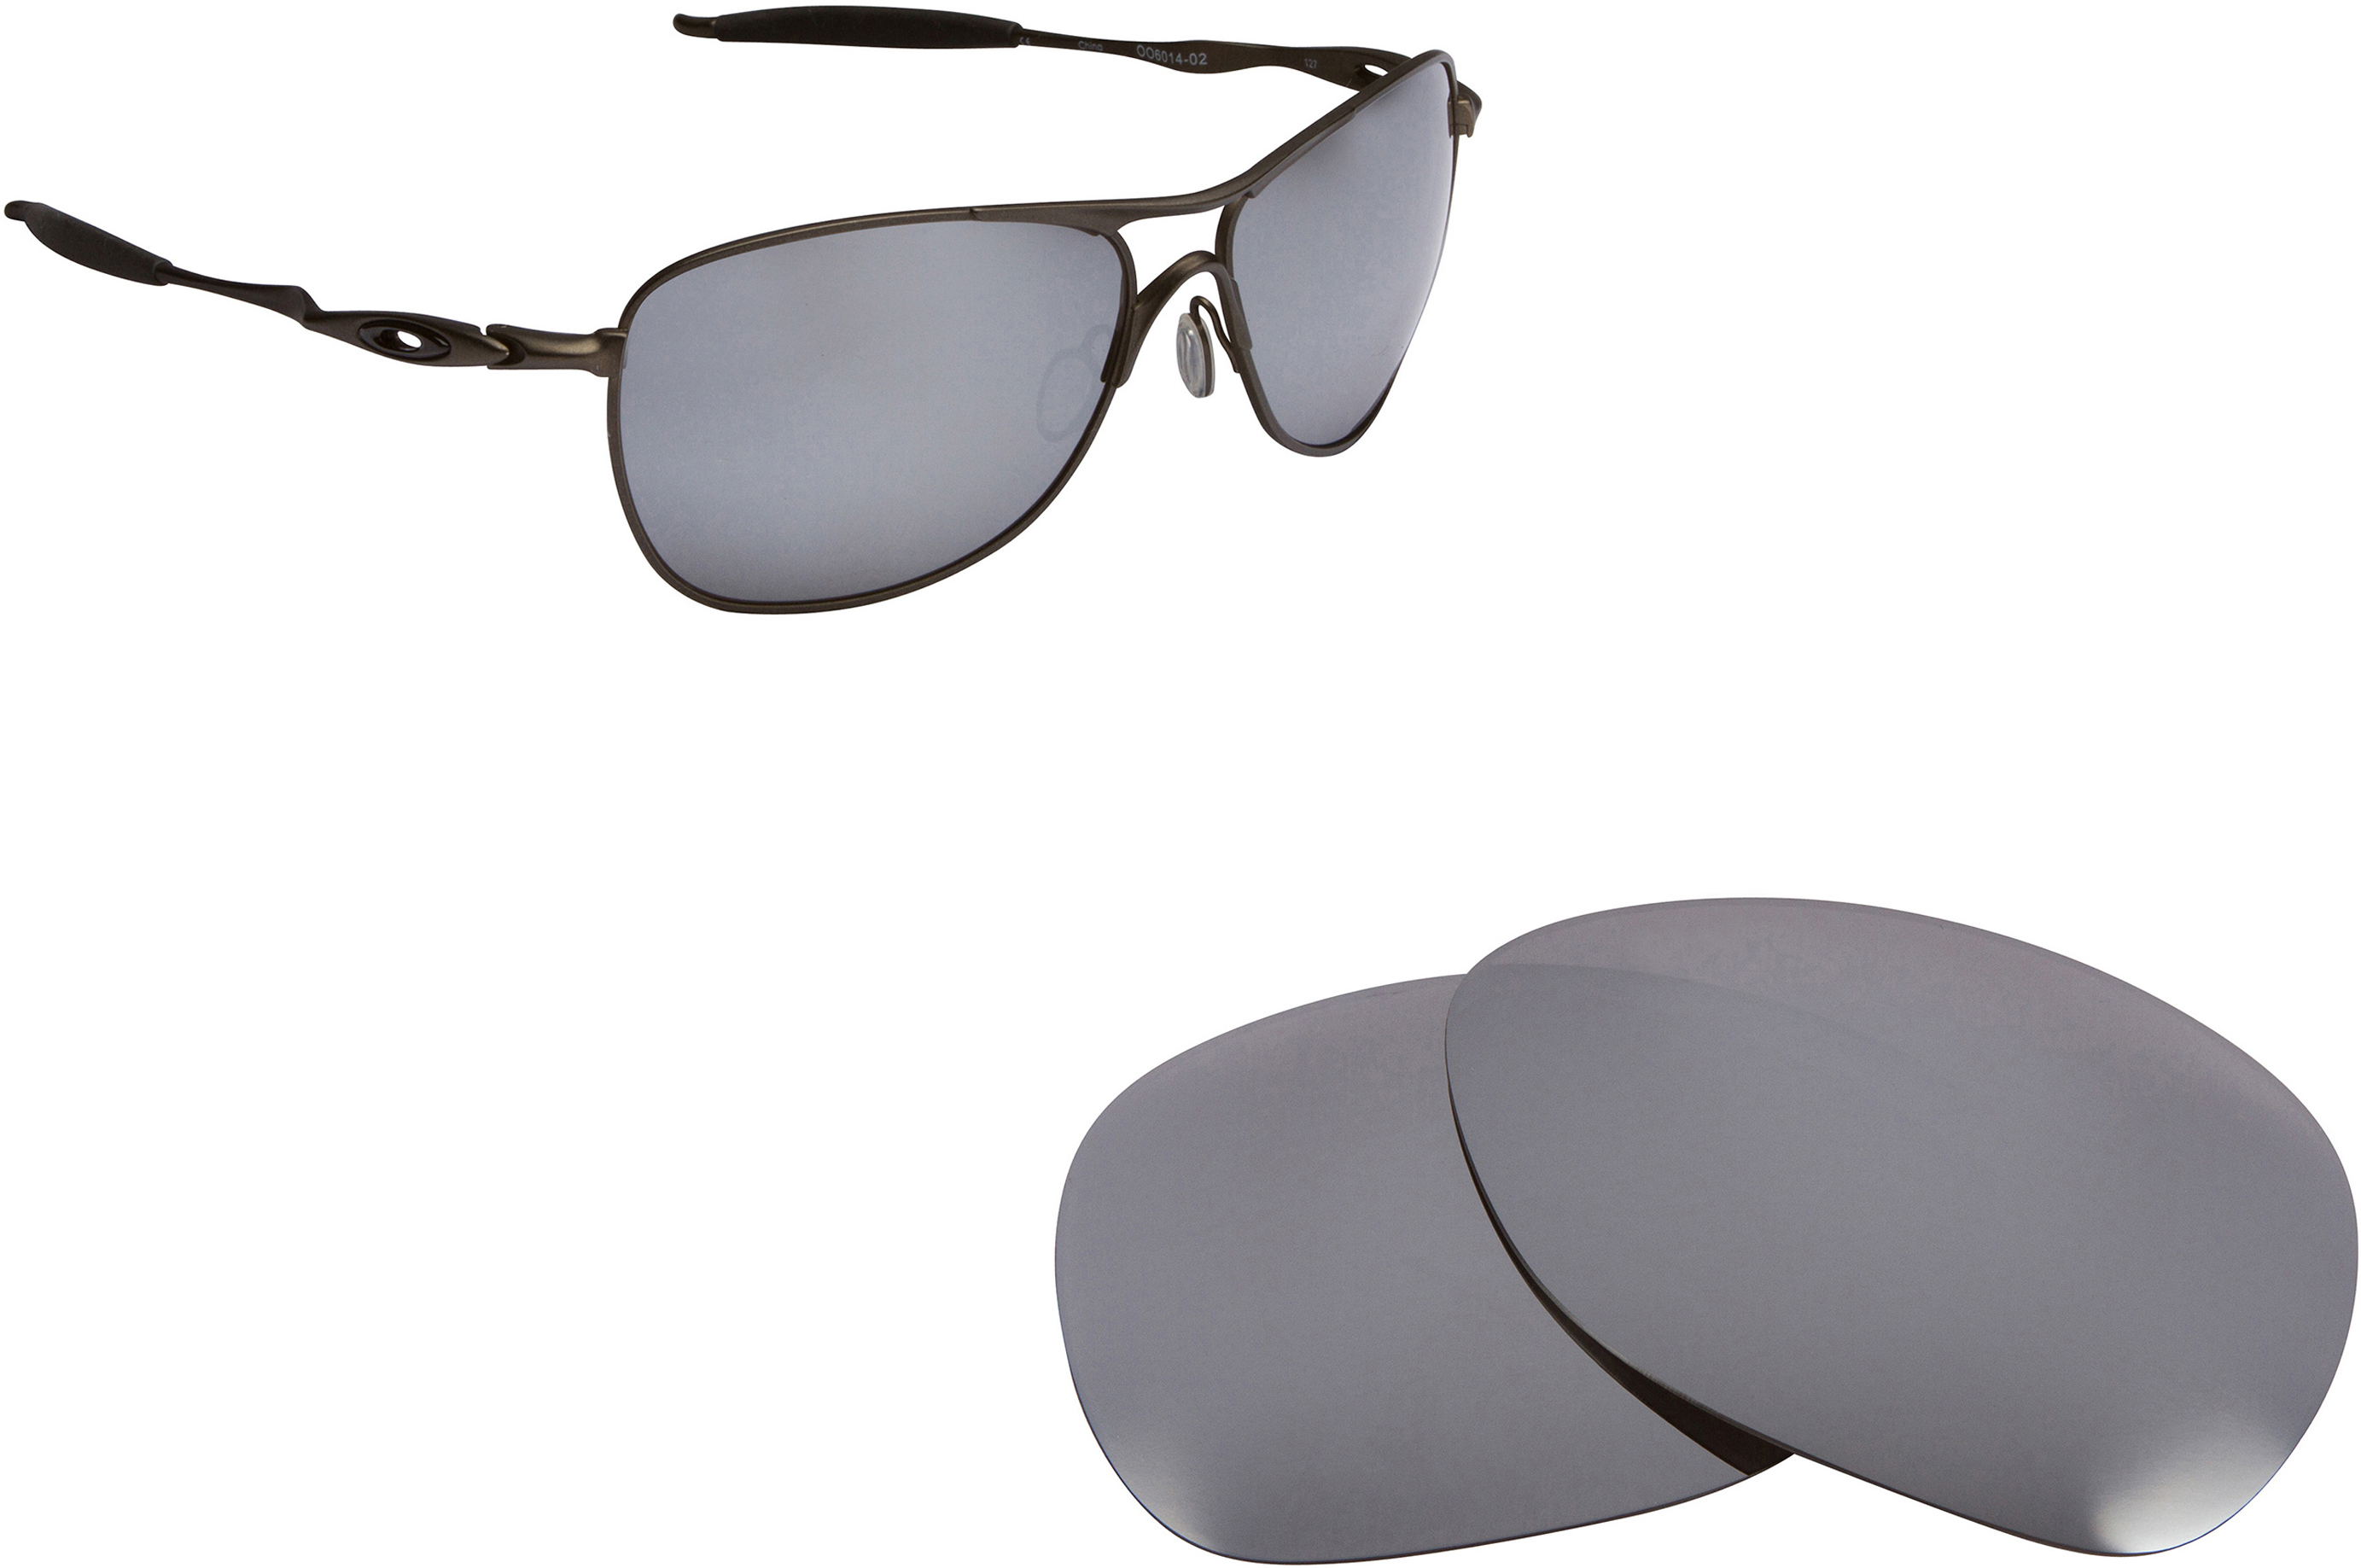 c56ca79a658 Oakley Crosshair 2.0 Polarized Mirror Sunglasses « Heritage Malta